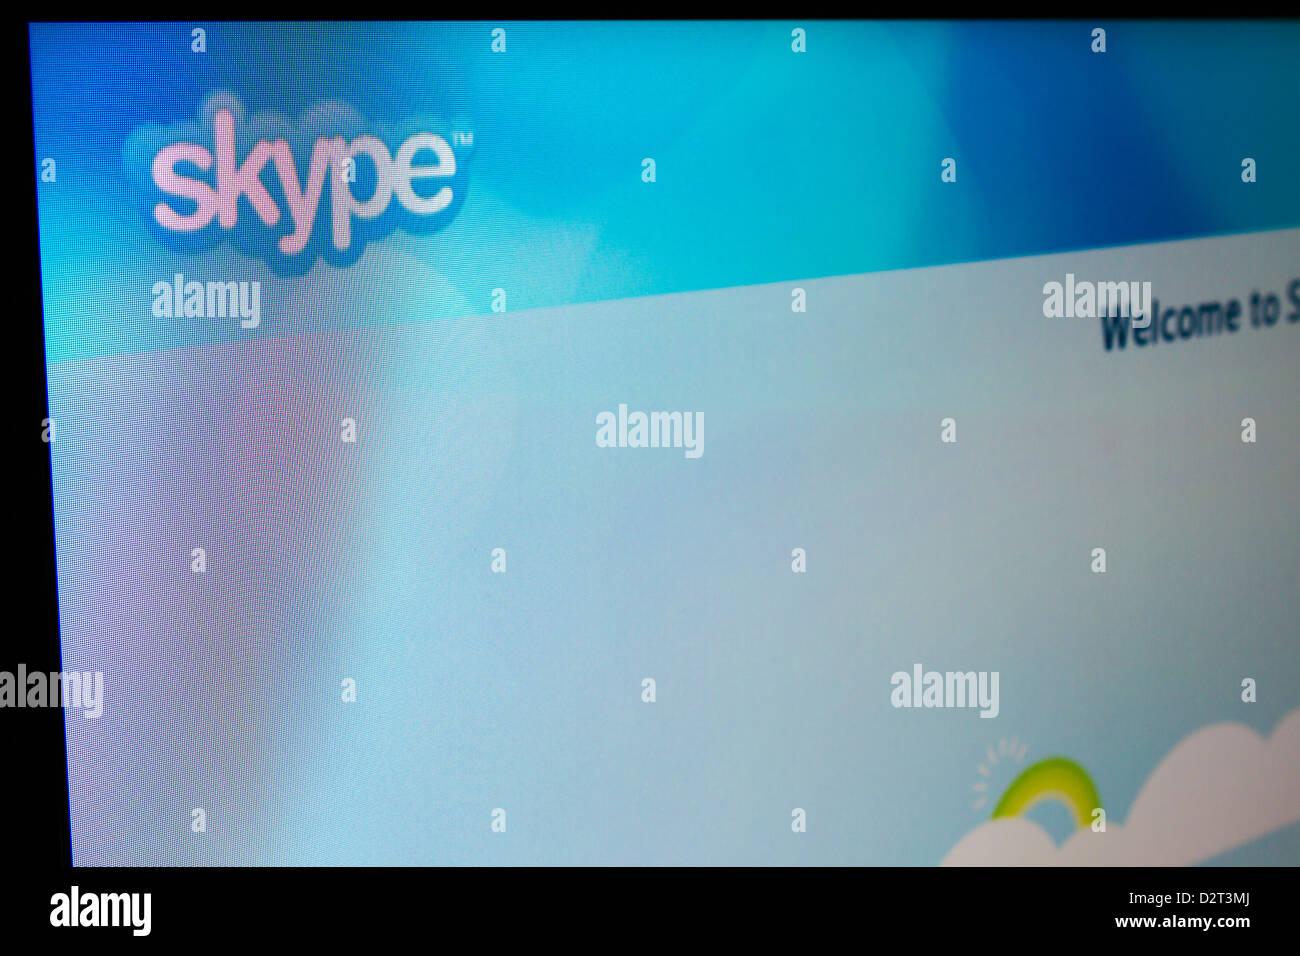 Samsung Smart Tv Stock Photos & Samsung Smart Tv Stock Images - Alamy